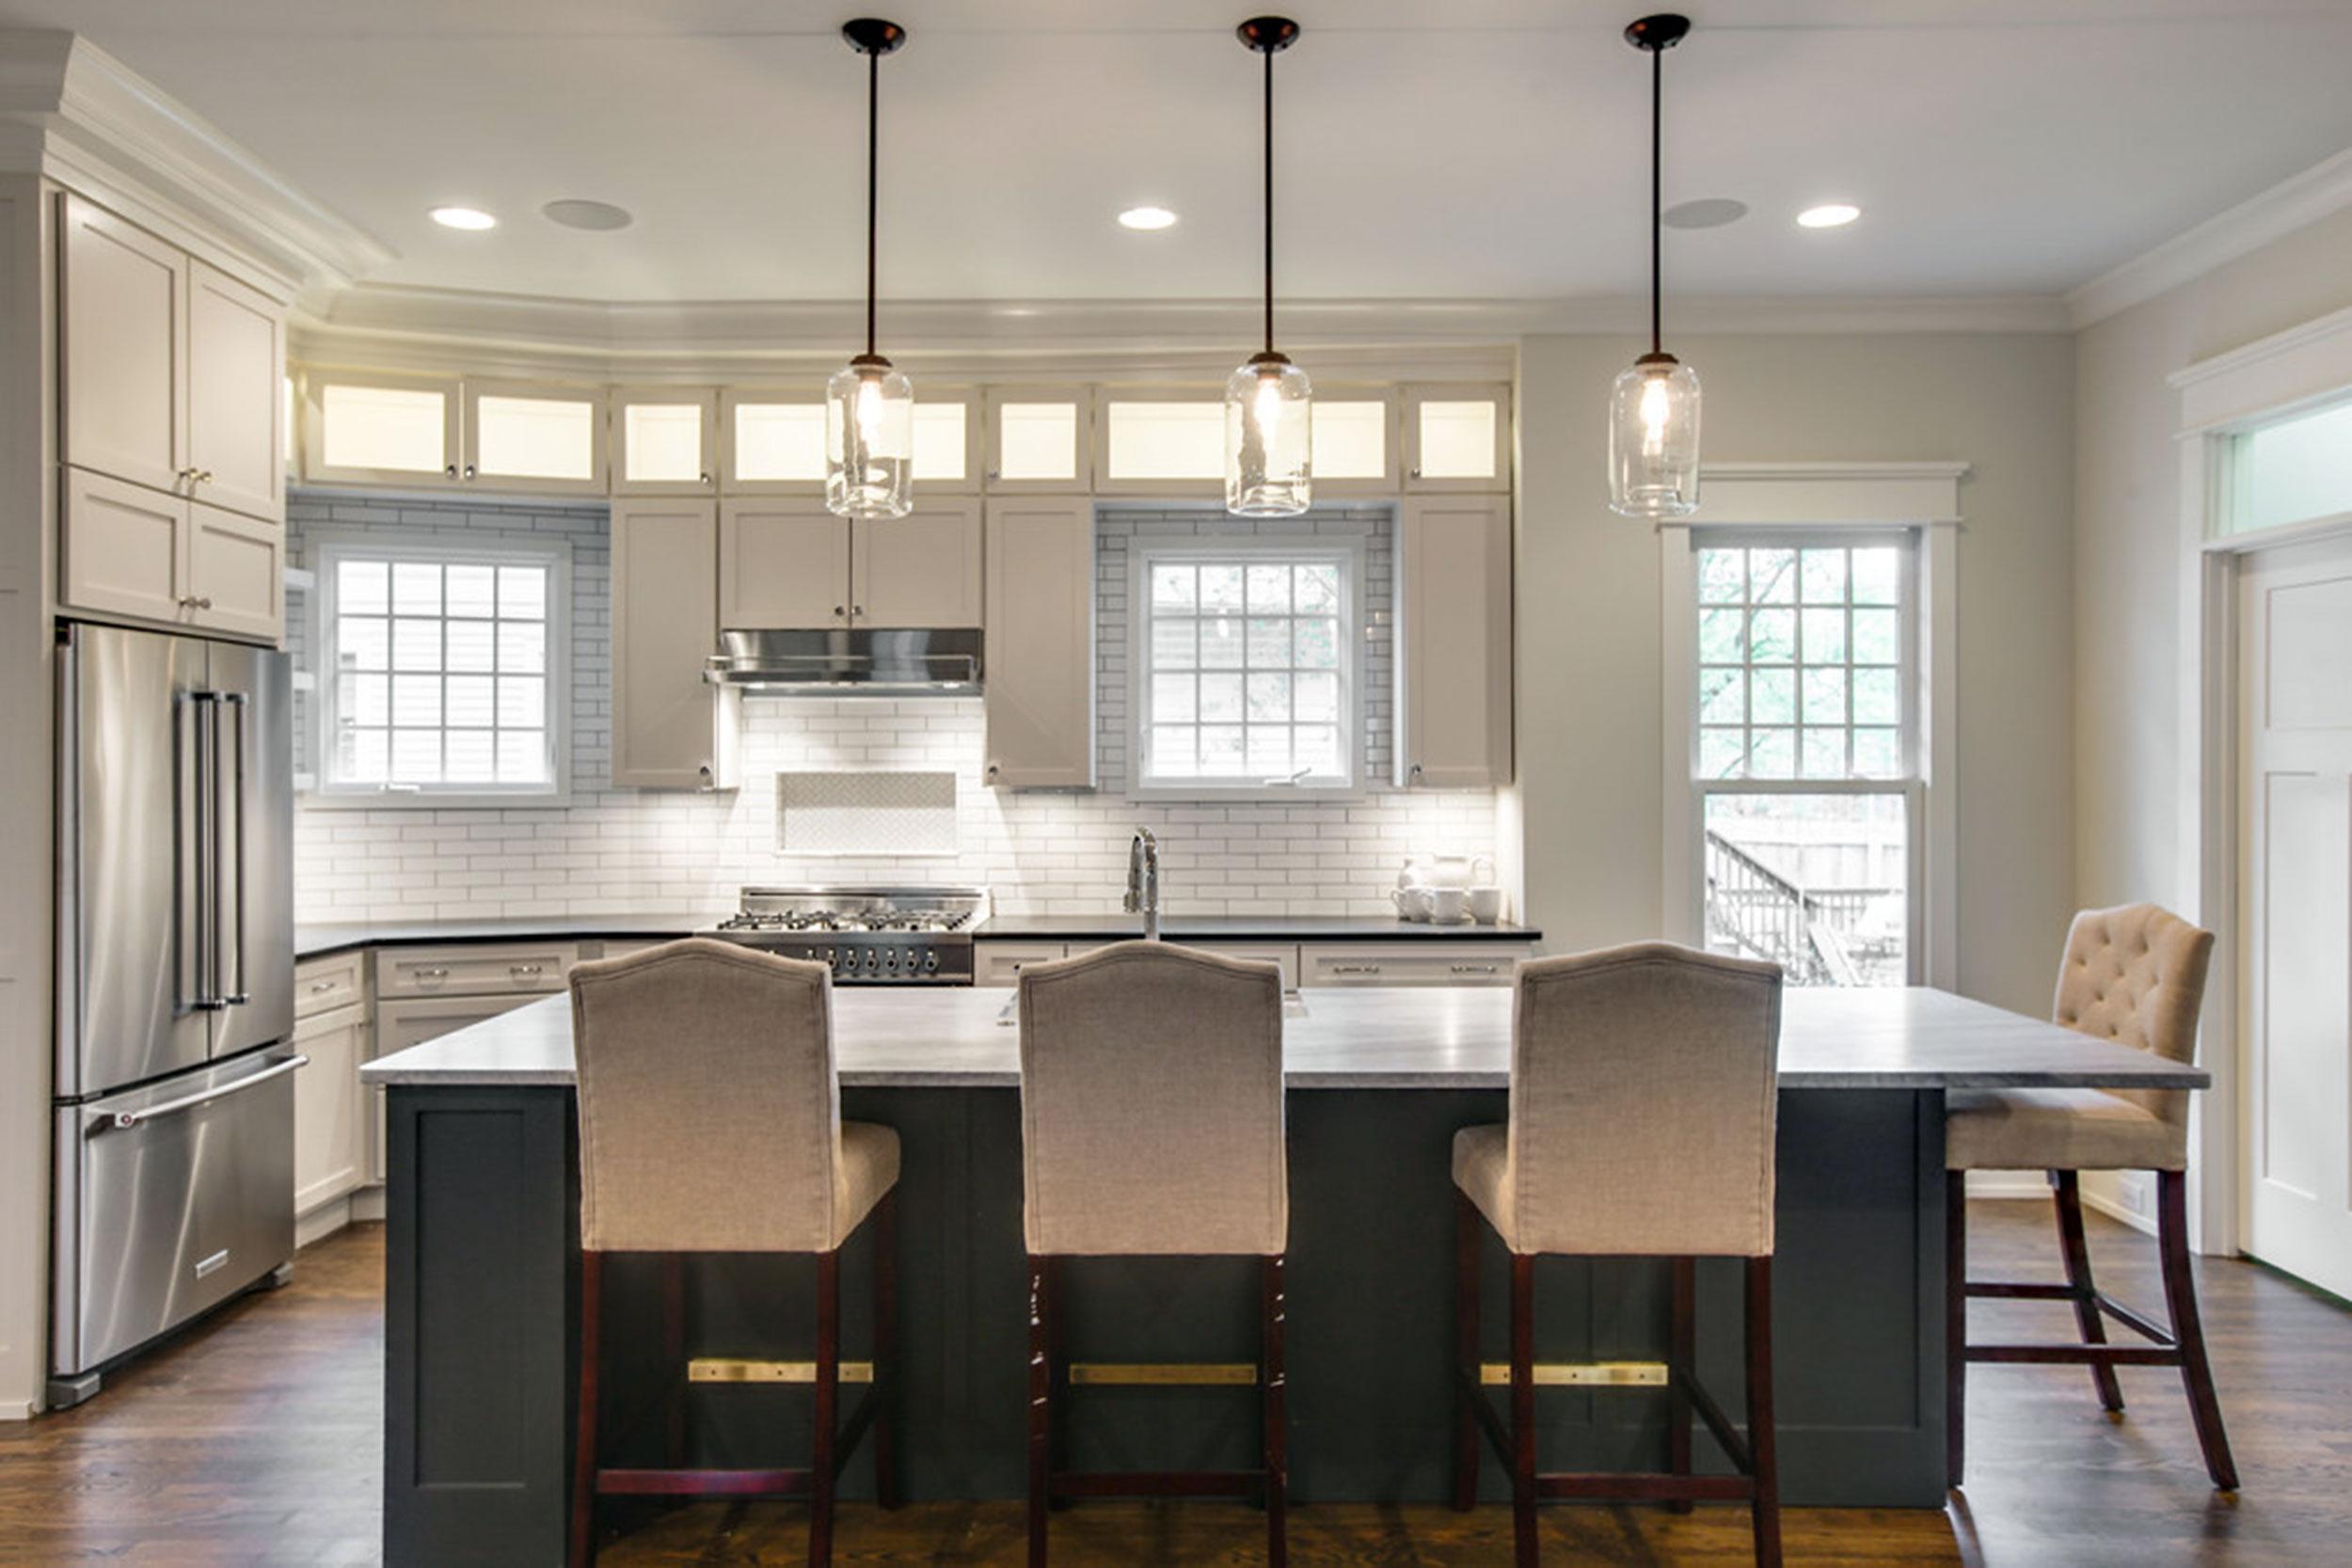 kitchen_glass_lights_island.jpg